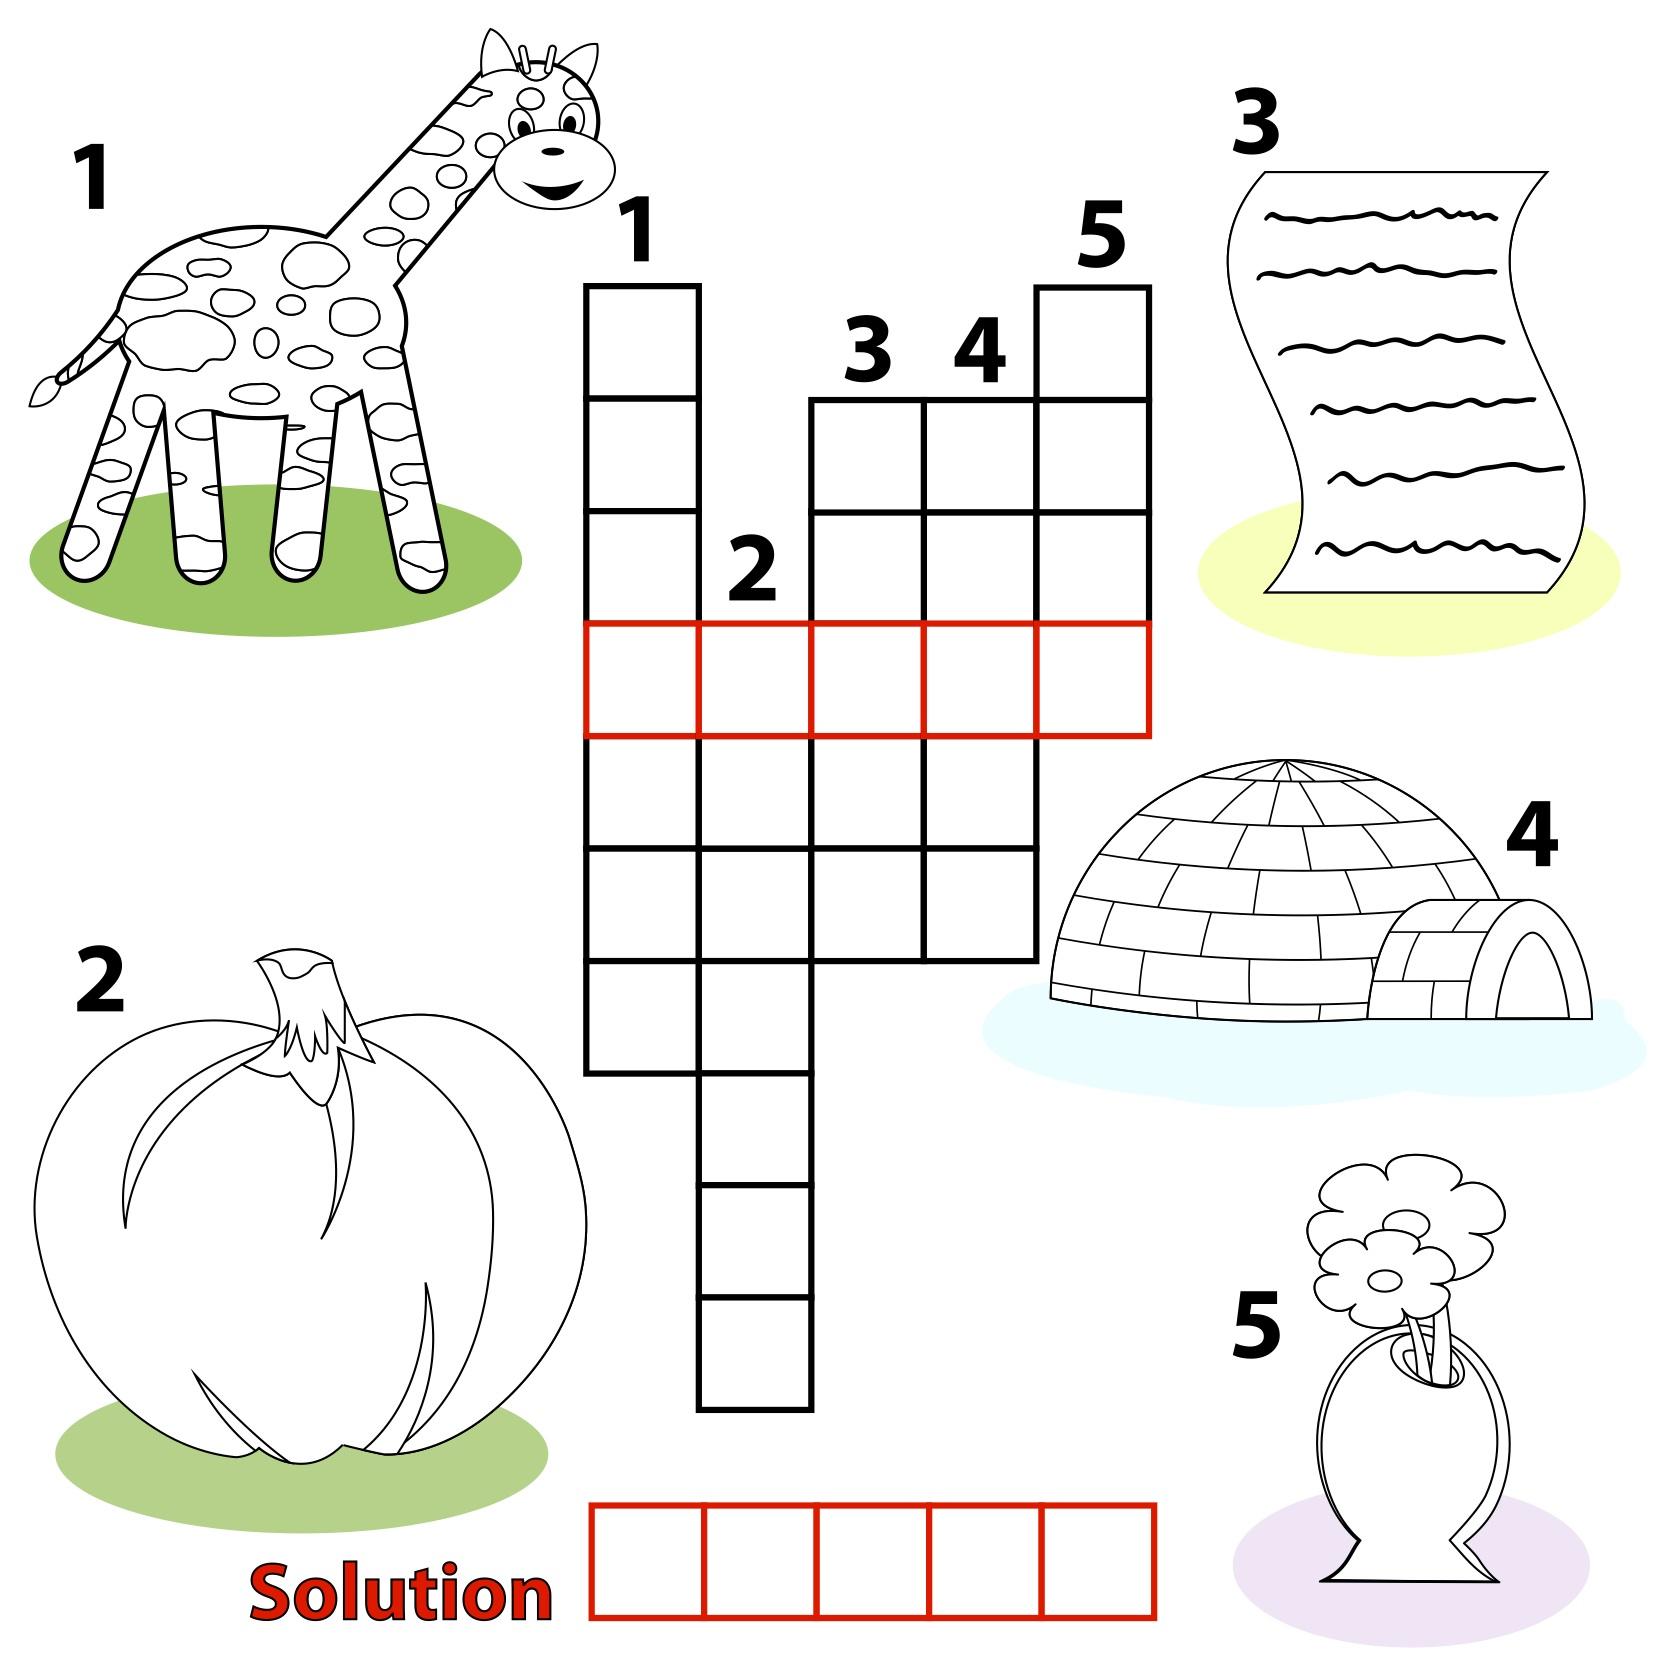 Free Printable Crossword Puzzles For Children